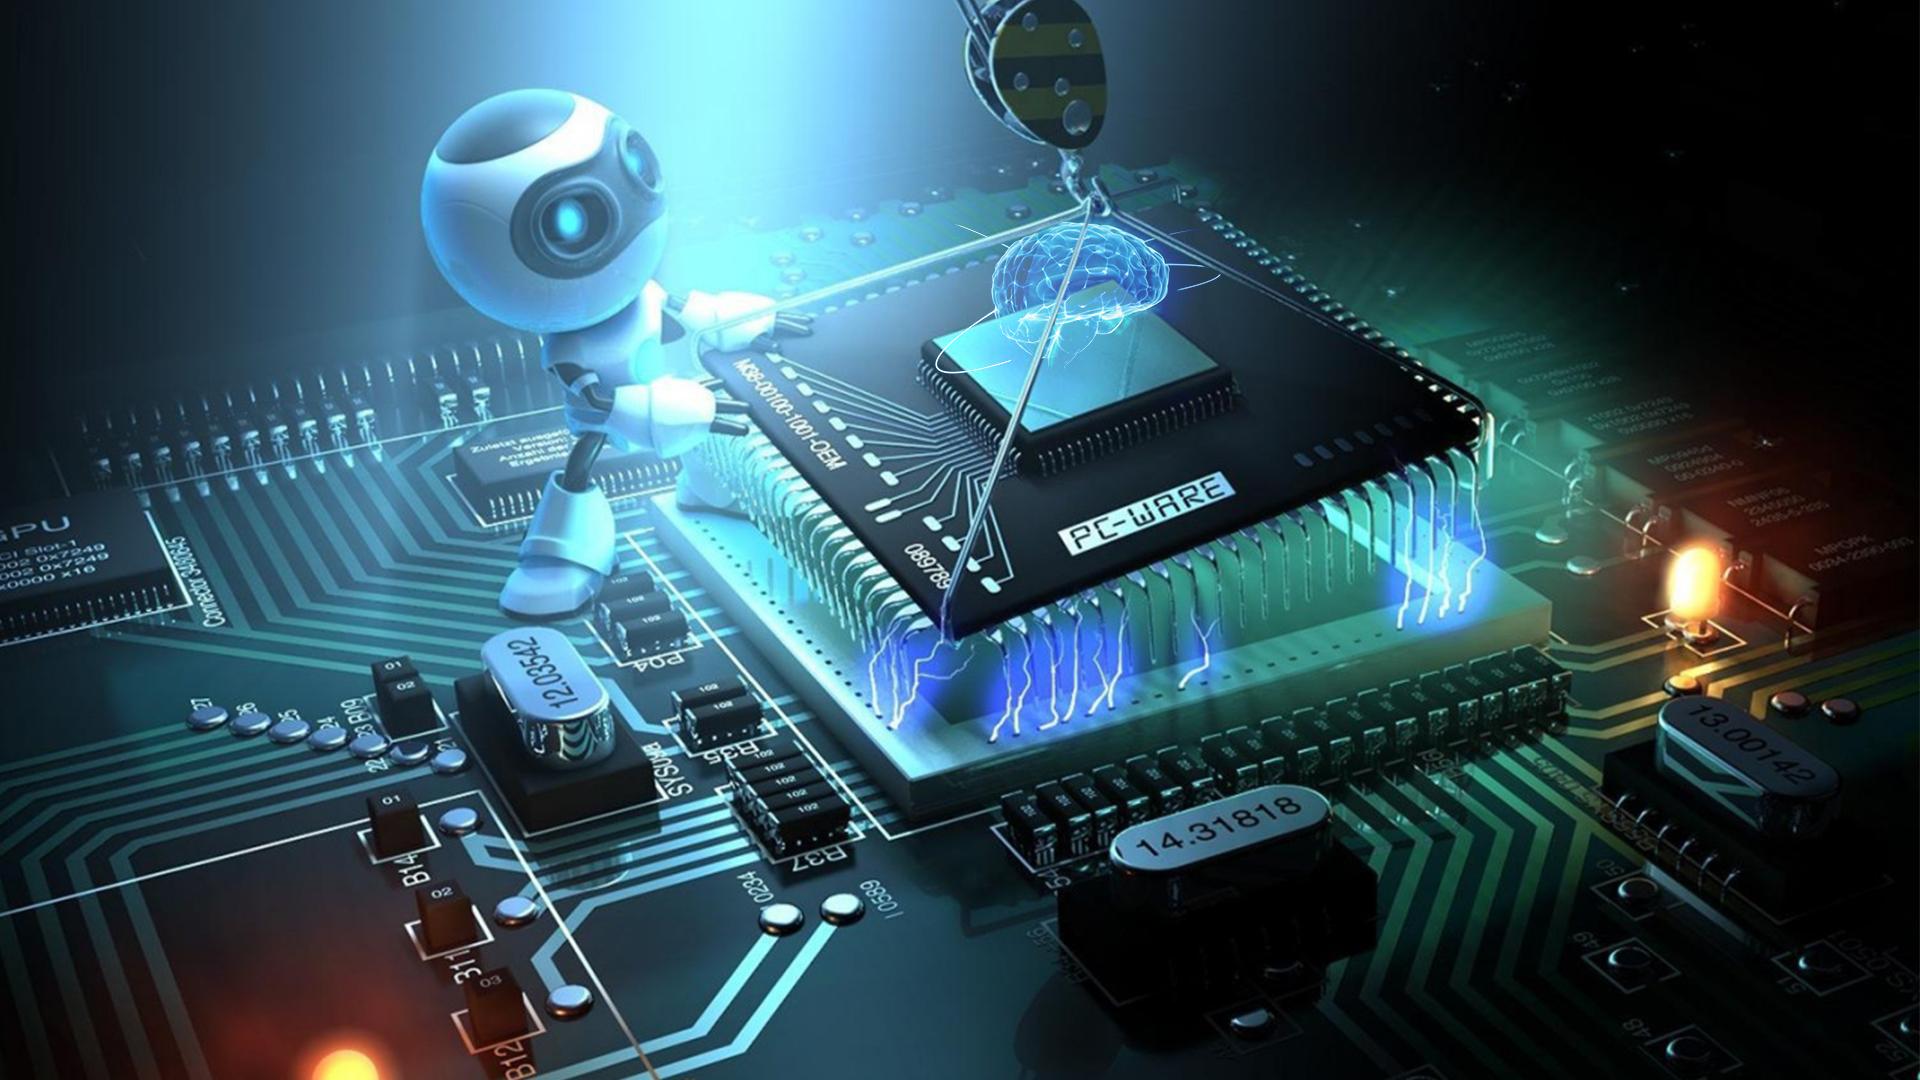 saul ameliach - Inteligencia Artificial